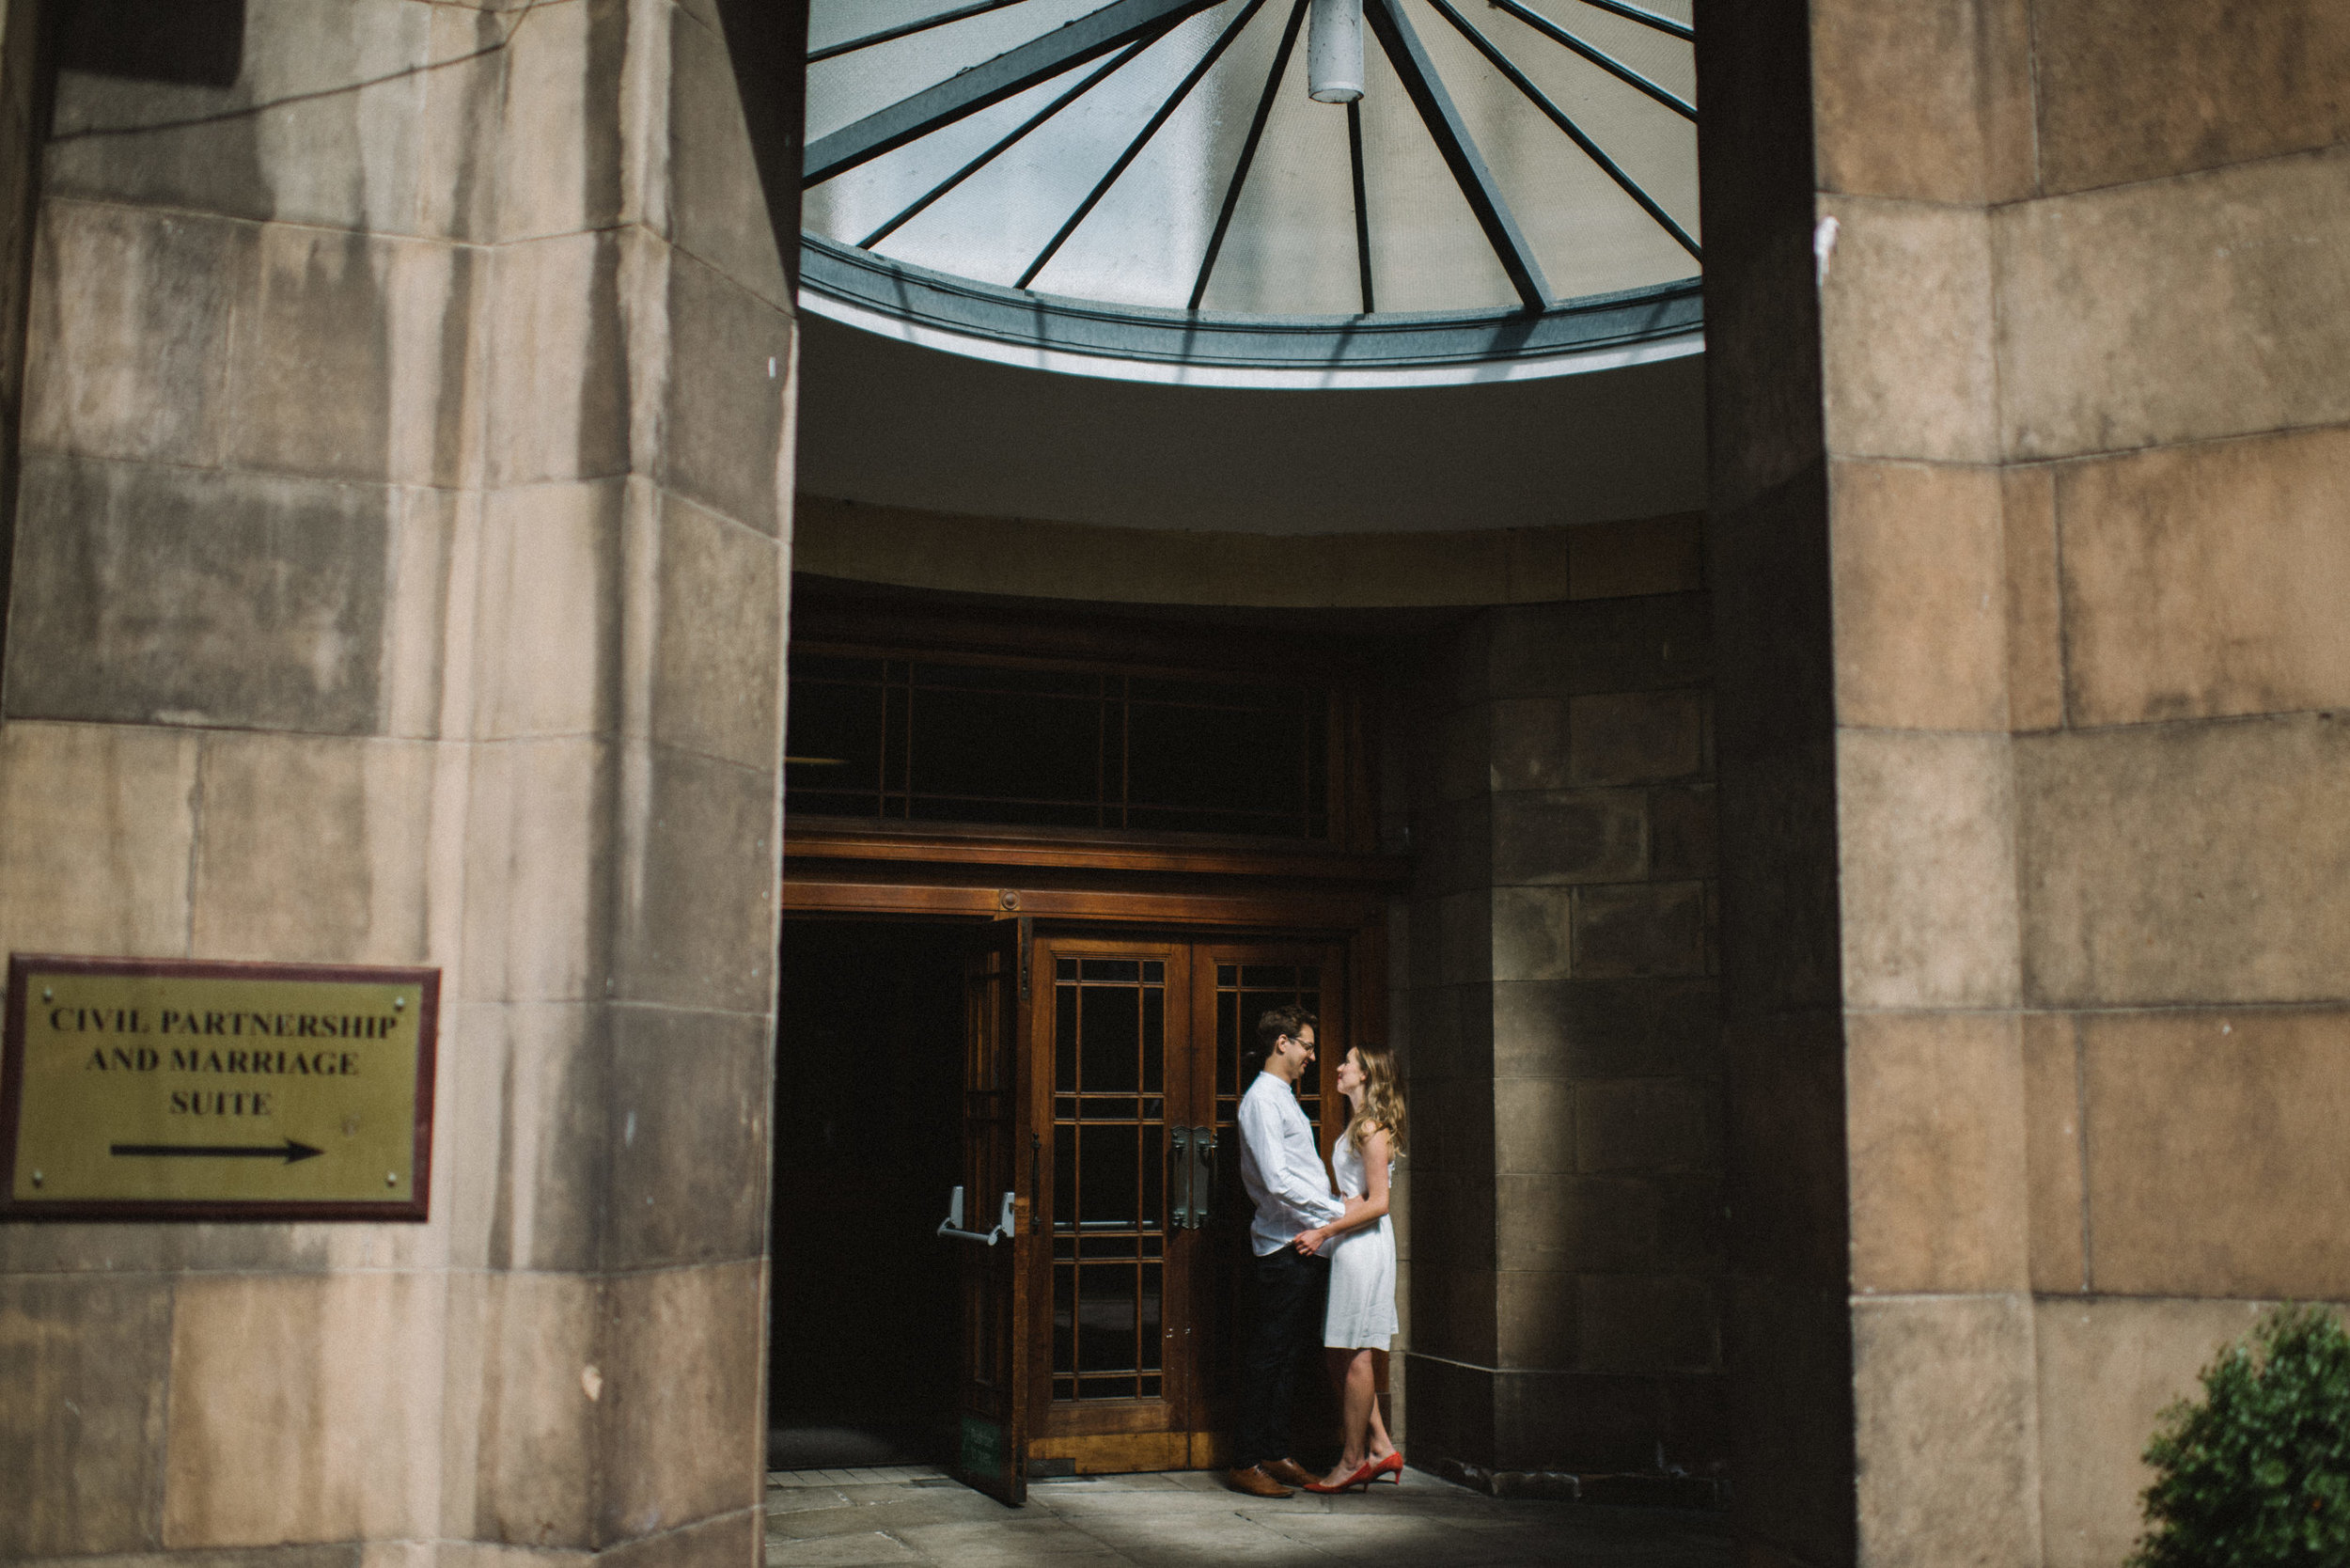 0061-LISA-DEVINE-PHOTOGRAPHY-ALTERNATIVE-WEDDING-PHOTOGRAPHY-SCOTLAND-DESTINATION-WEDDINGS-GLASGOW-WEDDINGS-COOL-WEDDINGS-STYLISH-WEDDINGS.JPG